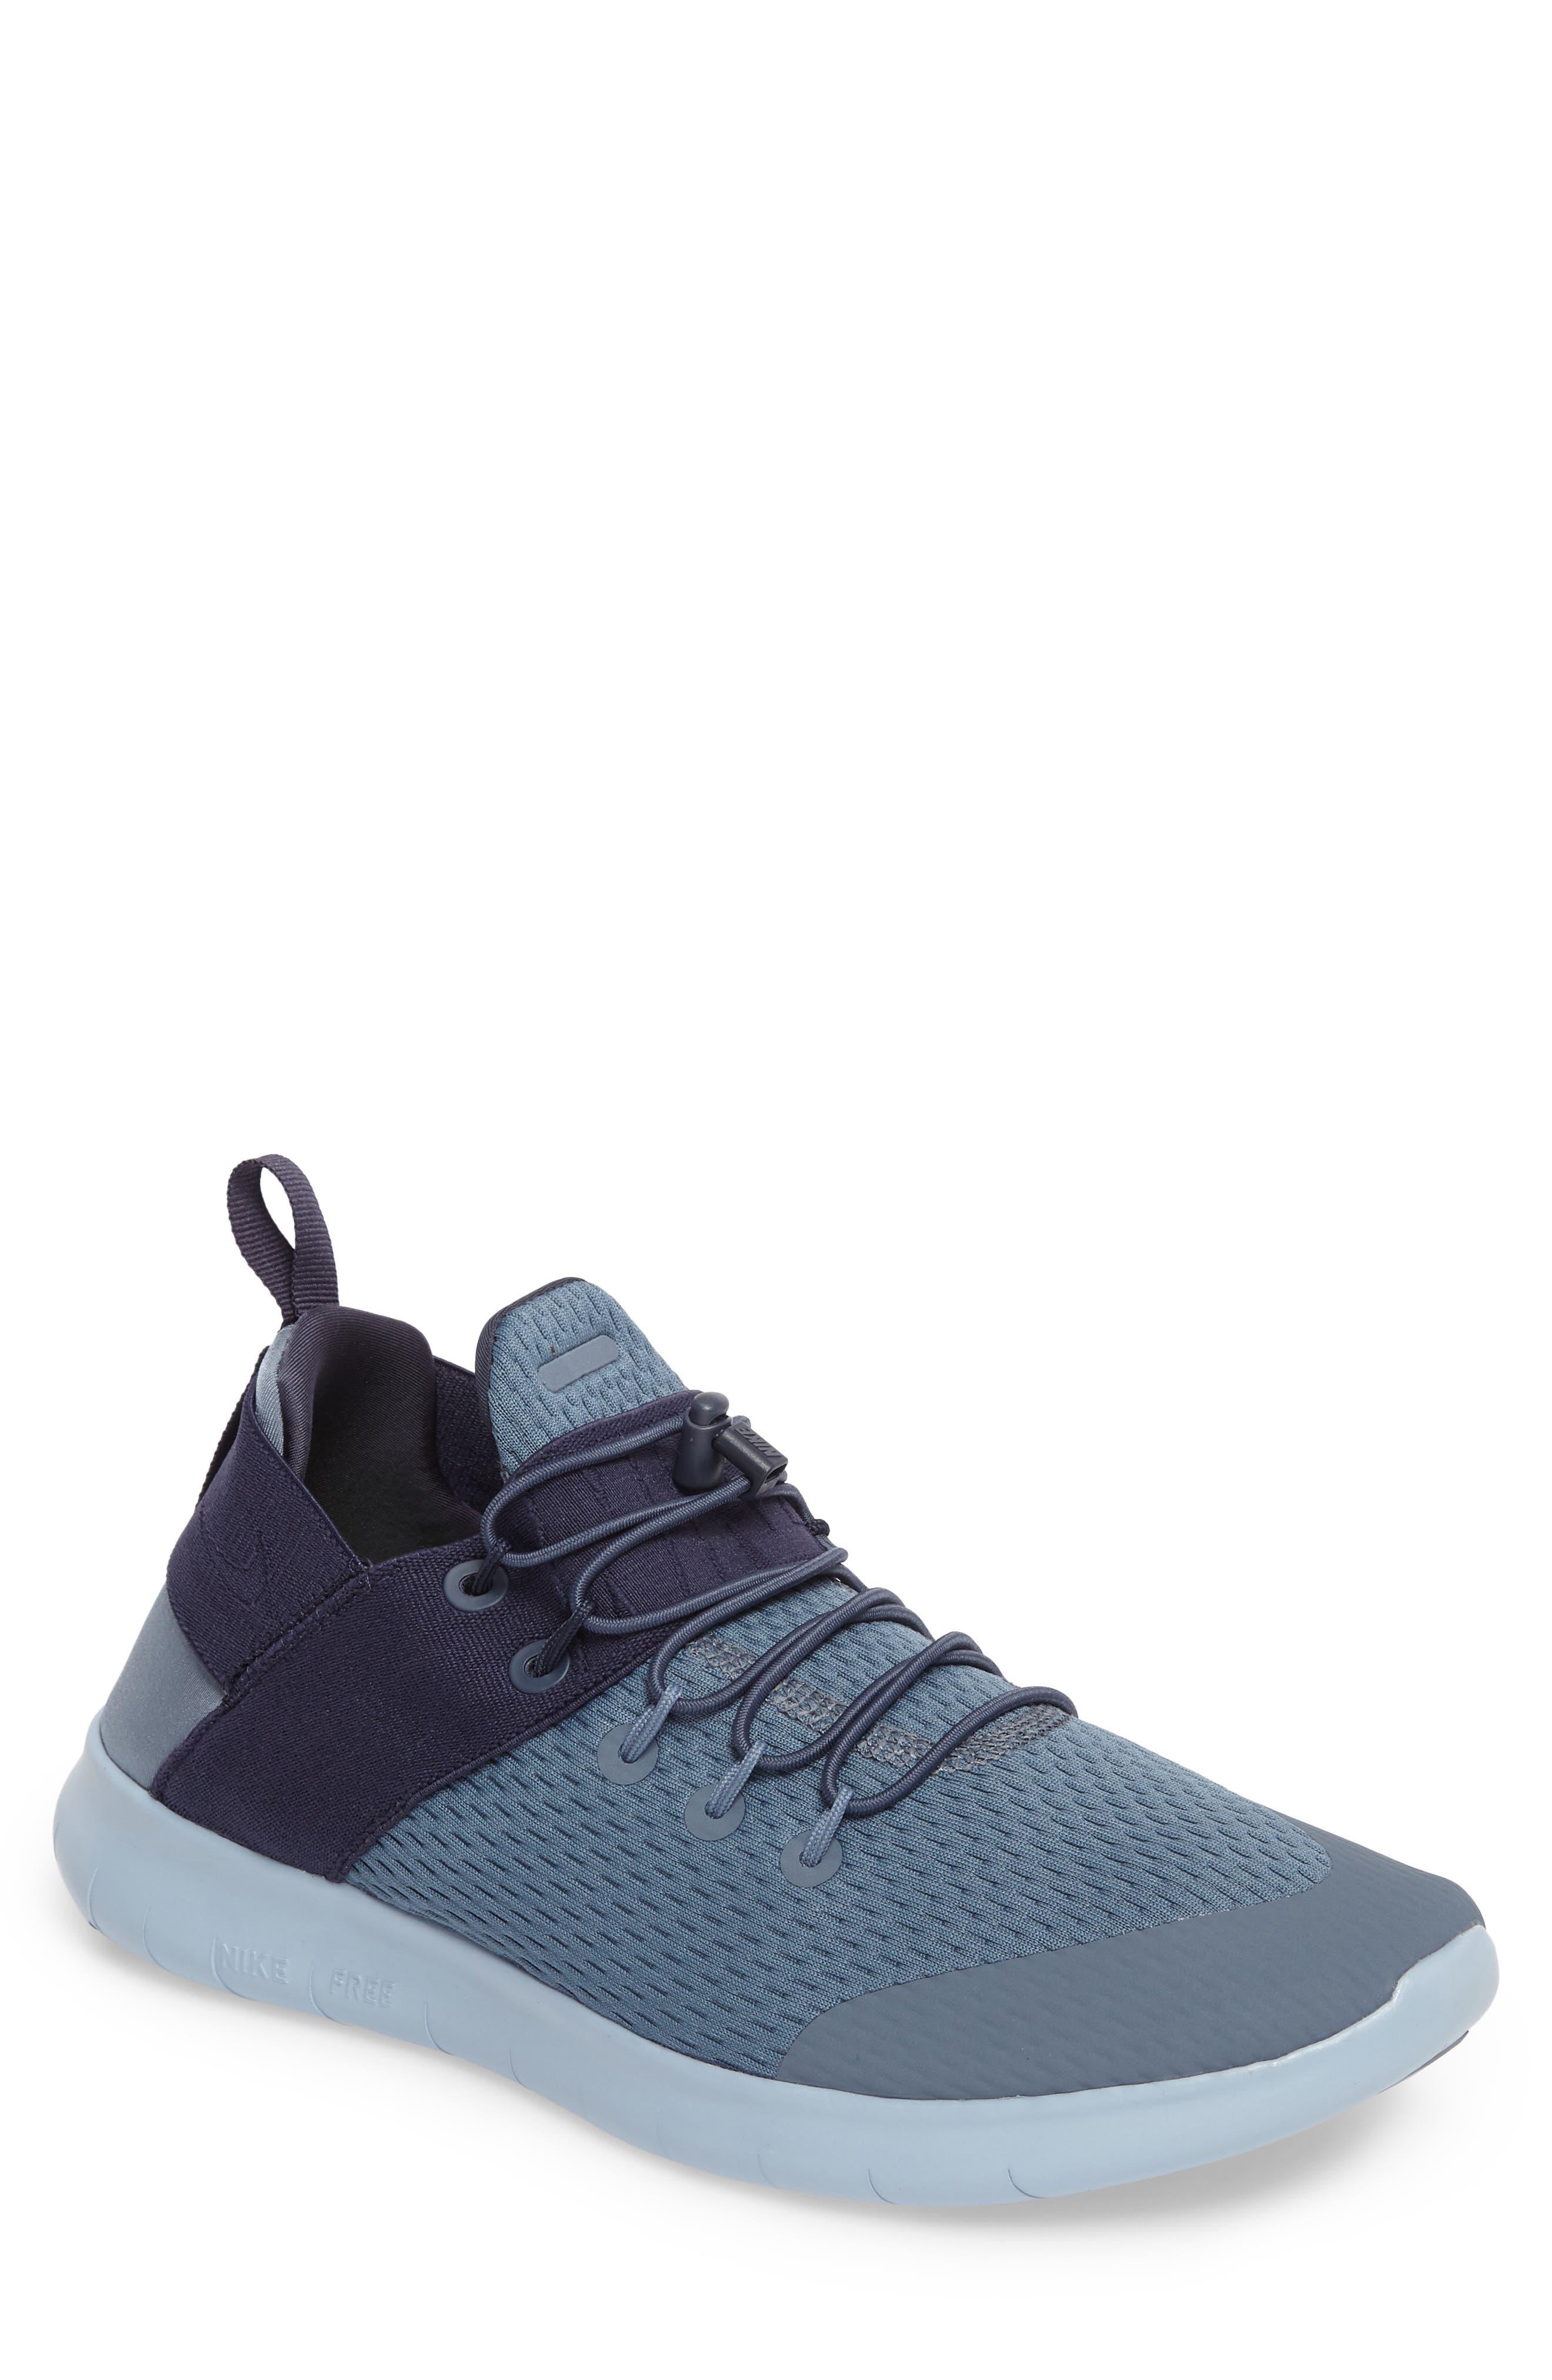 nike running shoes for men blue. main image - nike free rn cmtr 2 running shoe (men) shoes for men blue